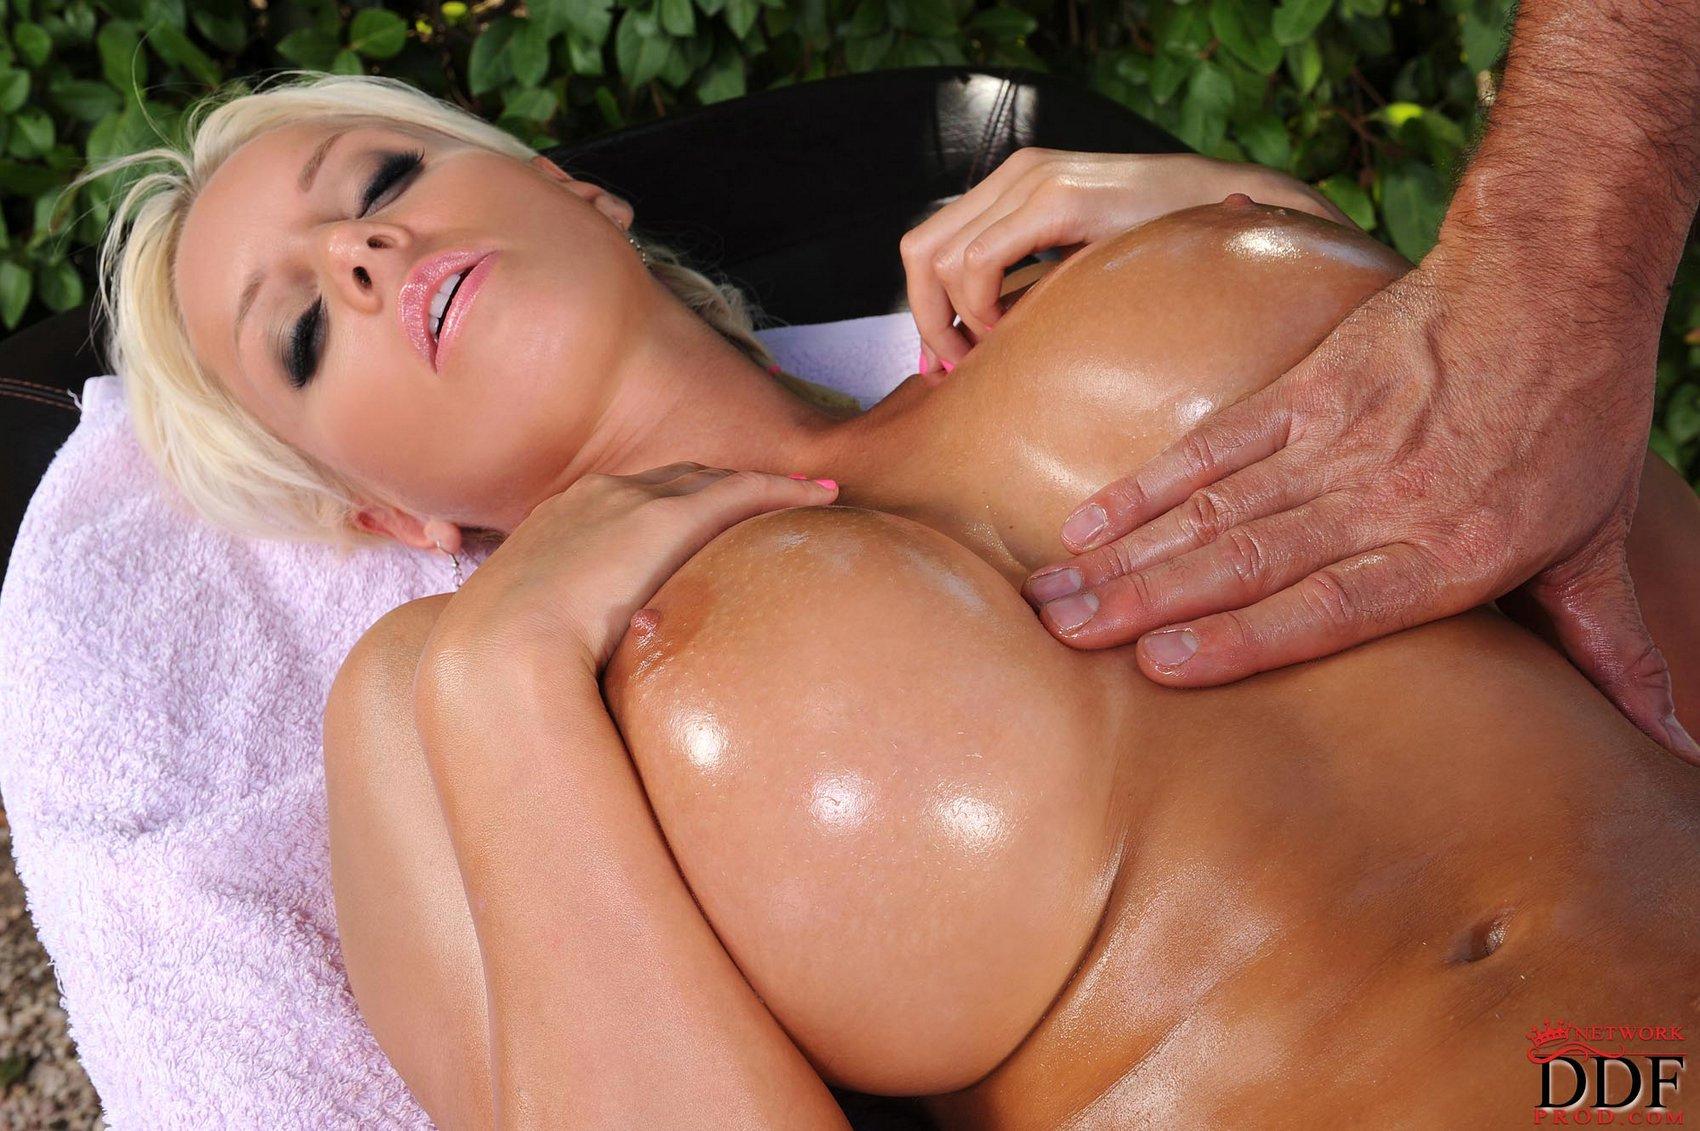 us pornstar escort www erotic massage